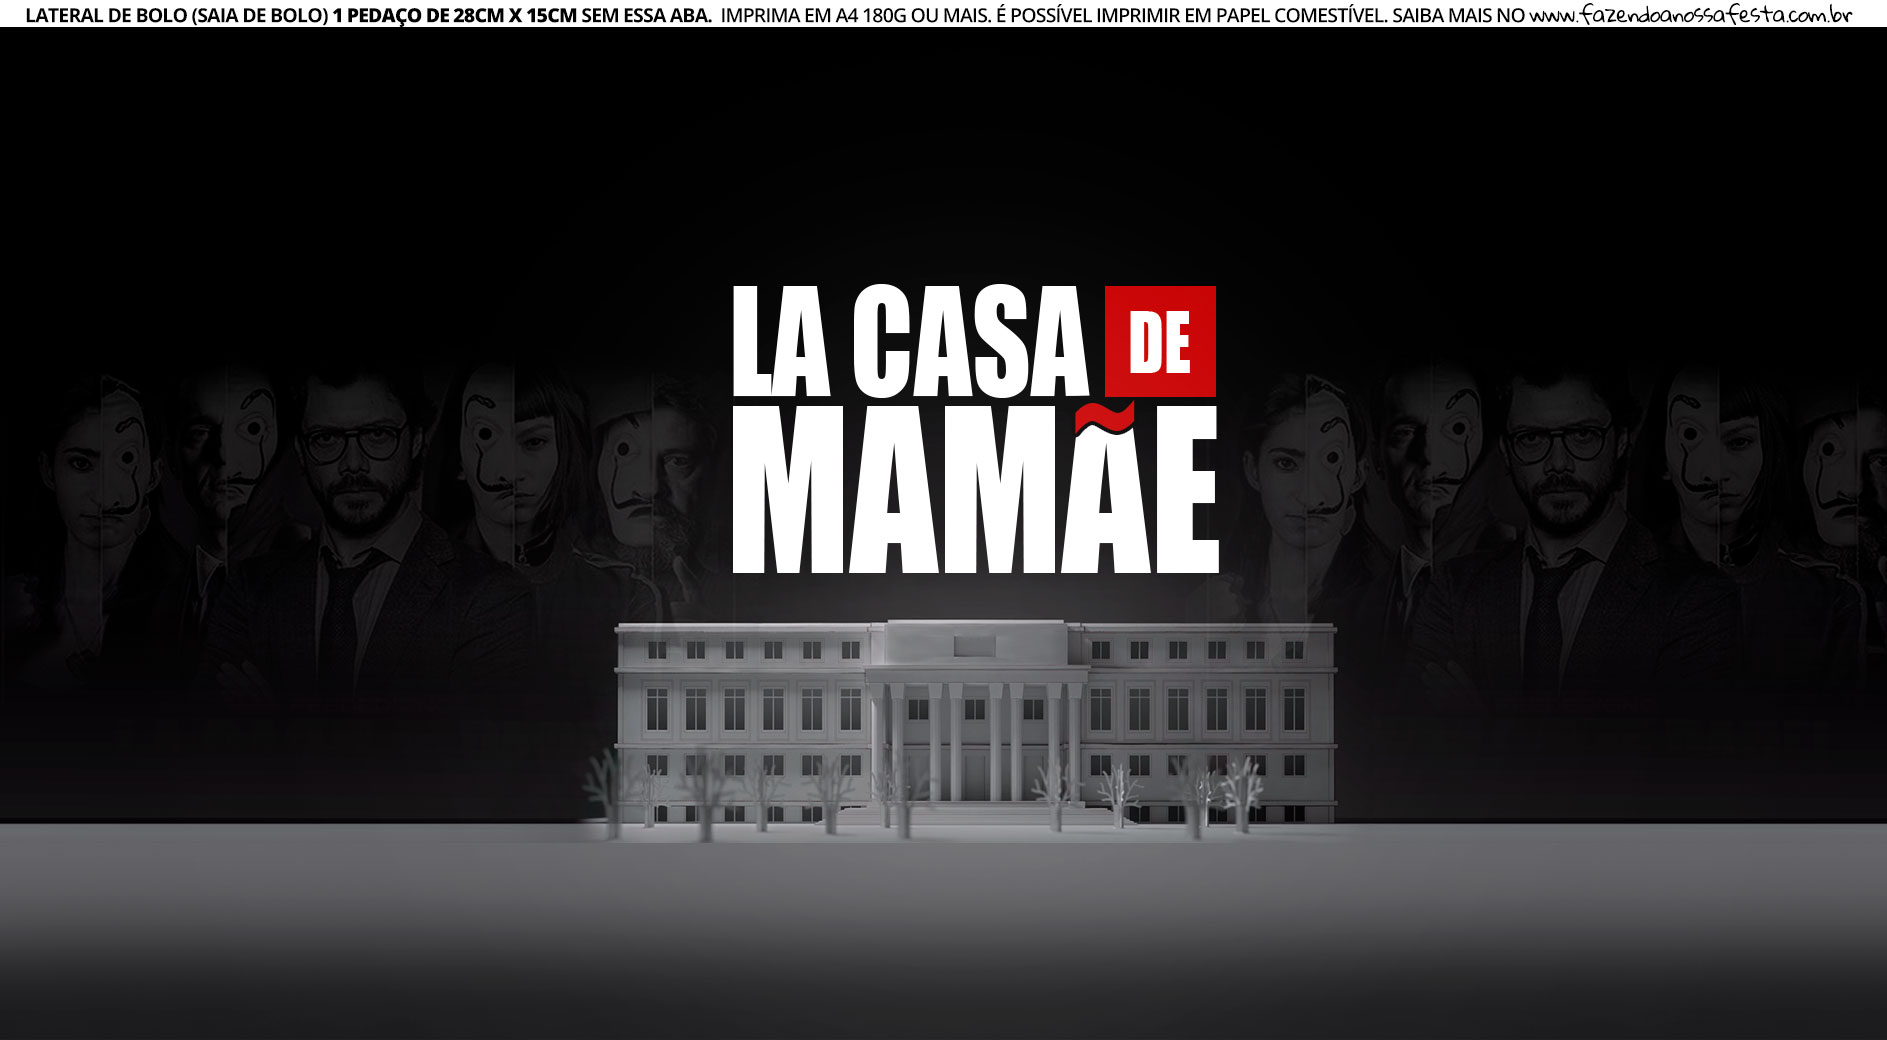 Lateral de Bolo La Casa de Mamae